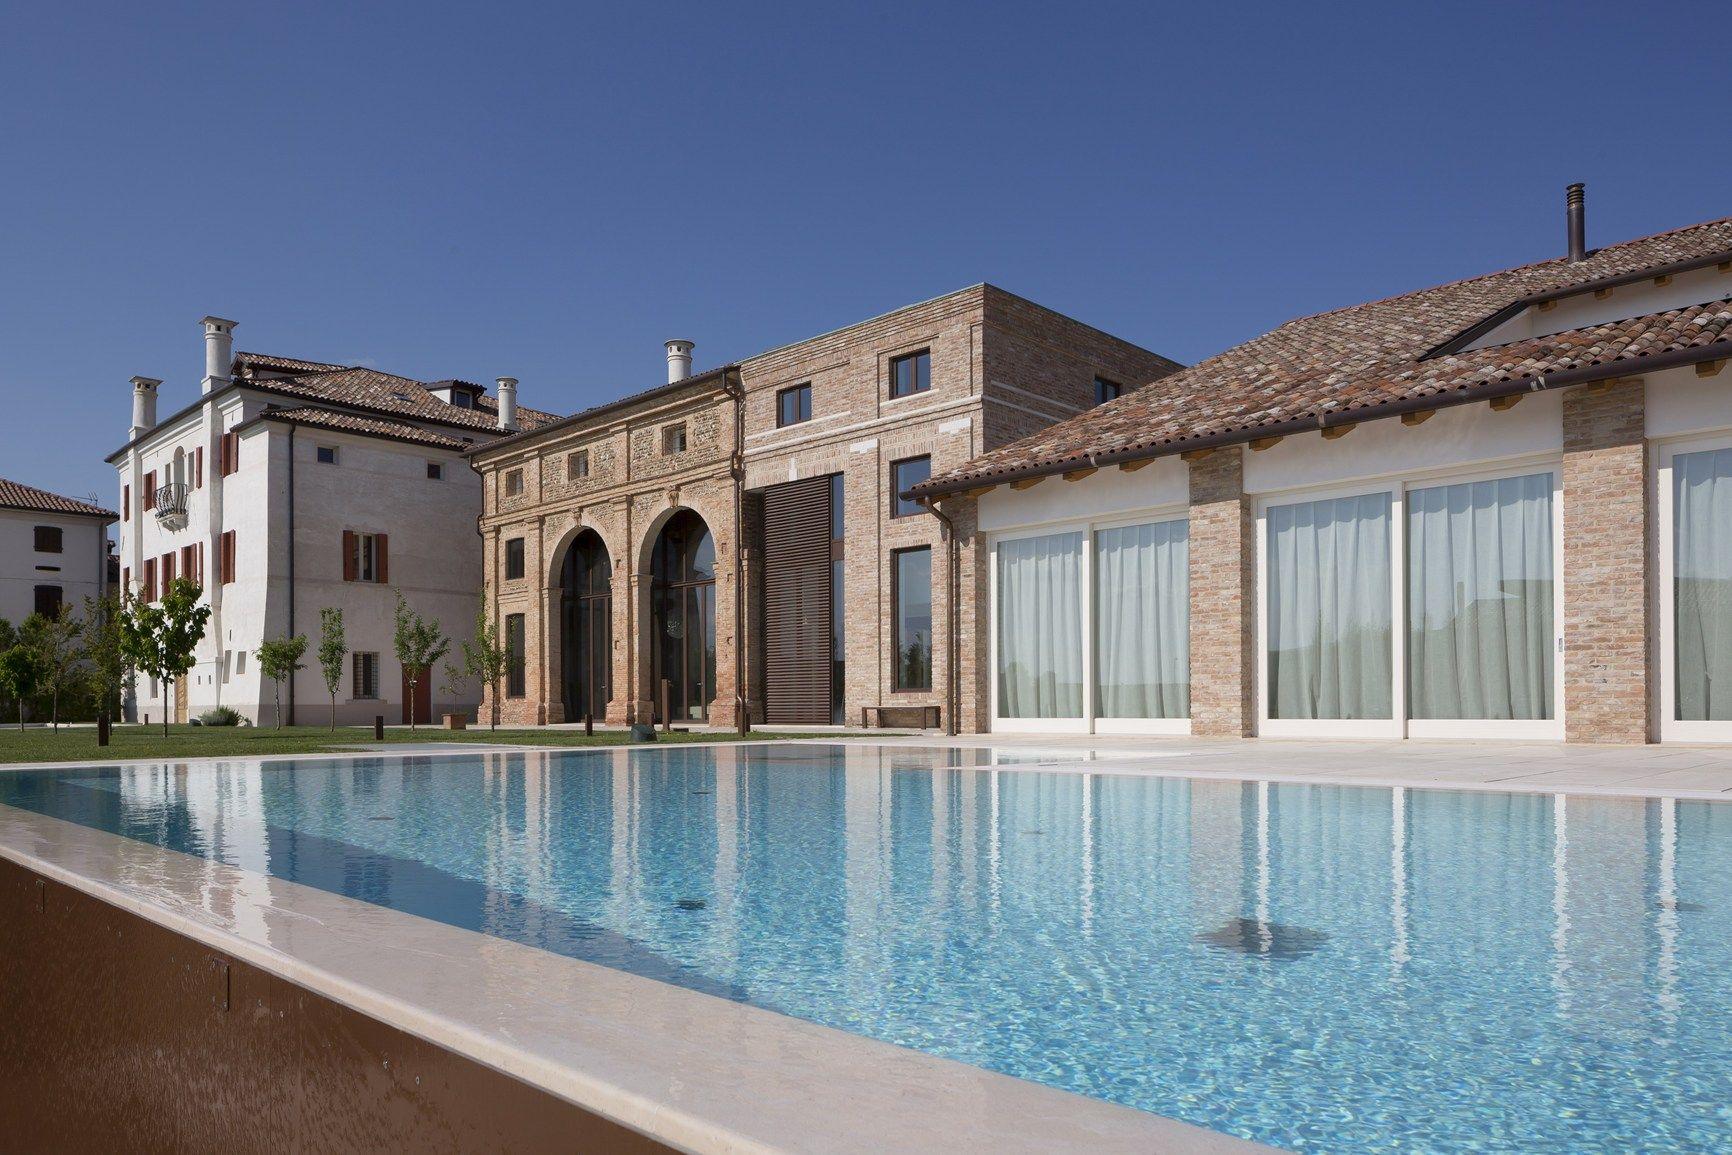 Villa Manin: una storica residenza veneta si trasforma in resort